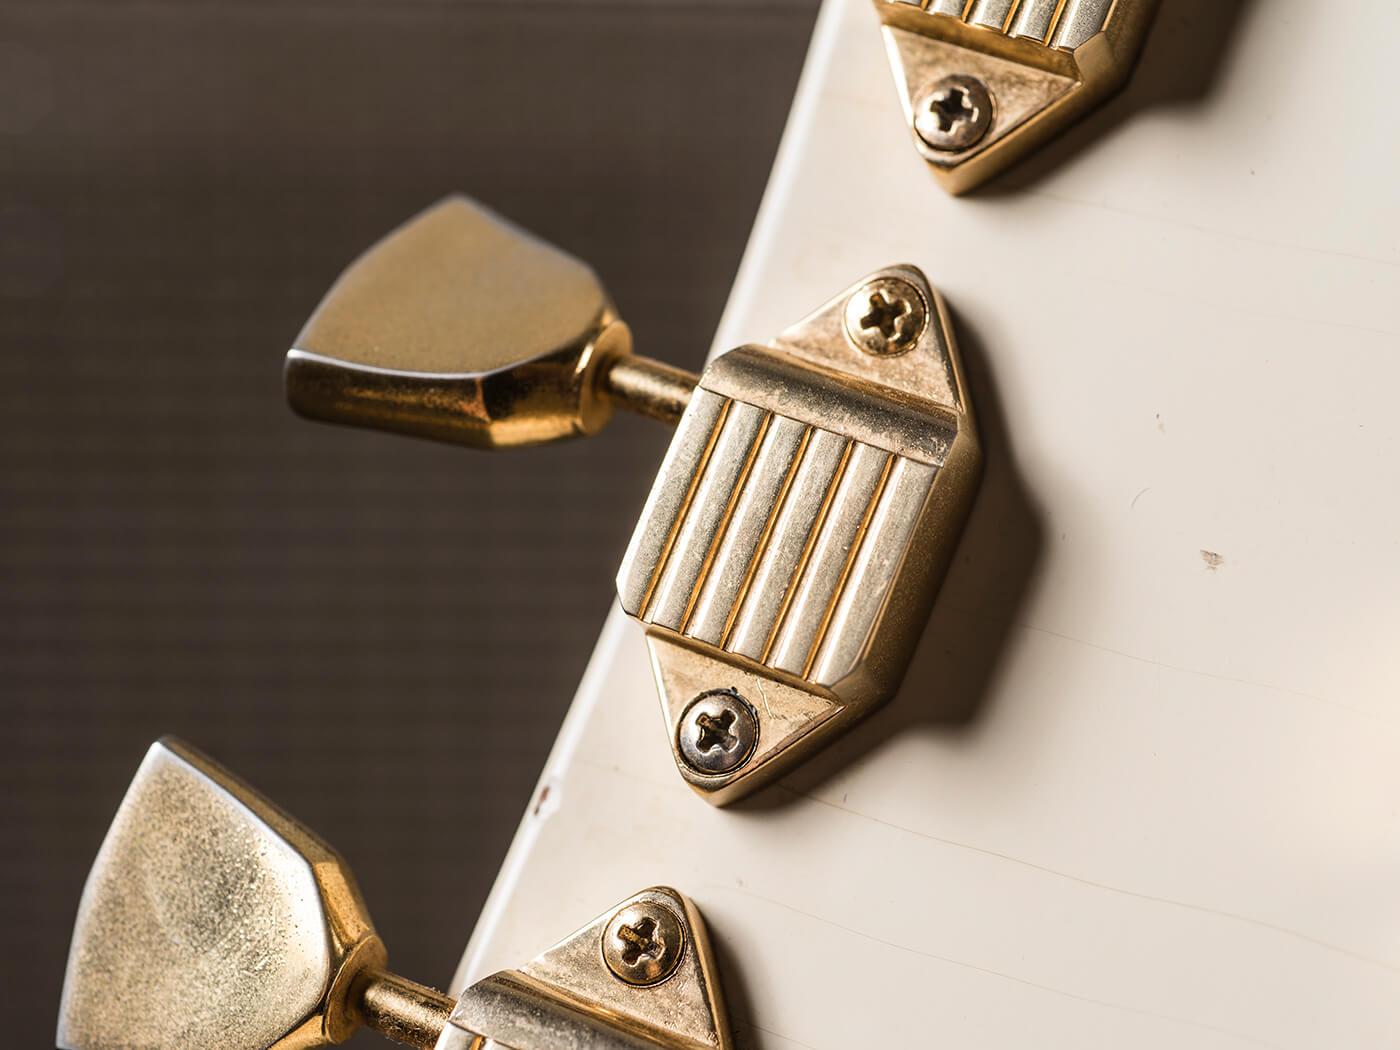 Gary Gand 1964 SG Custom (Tuner)